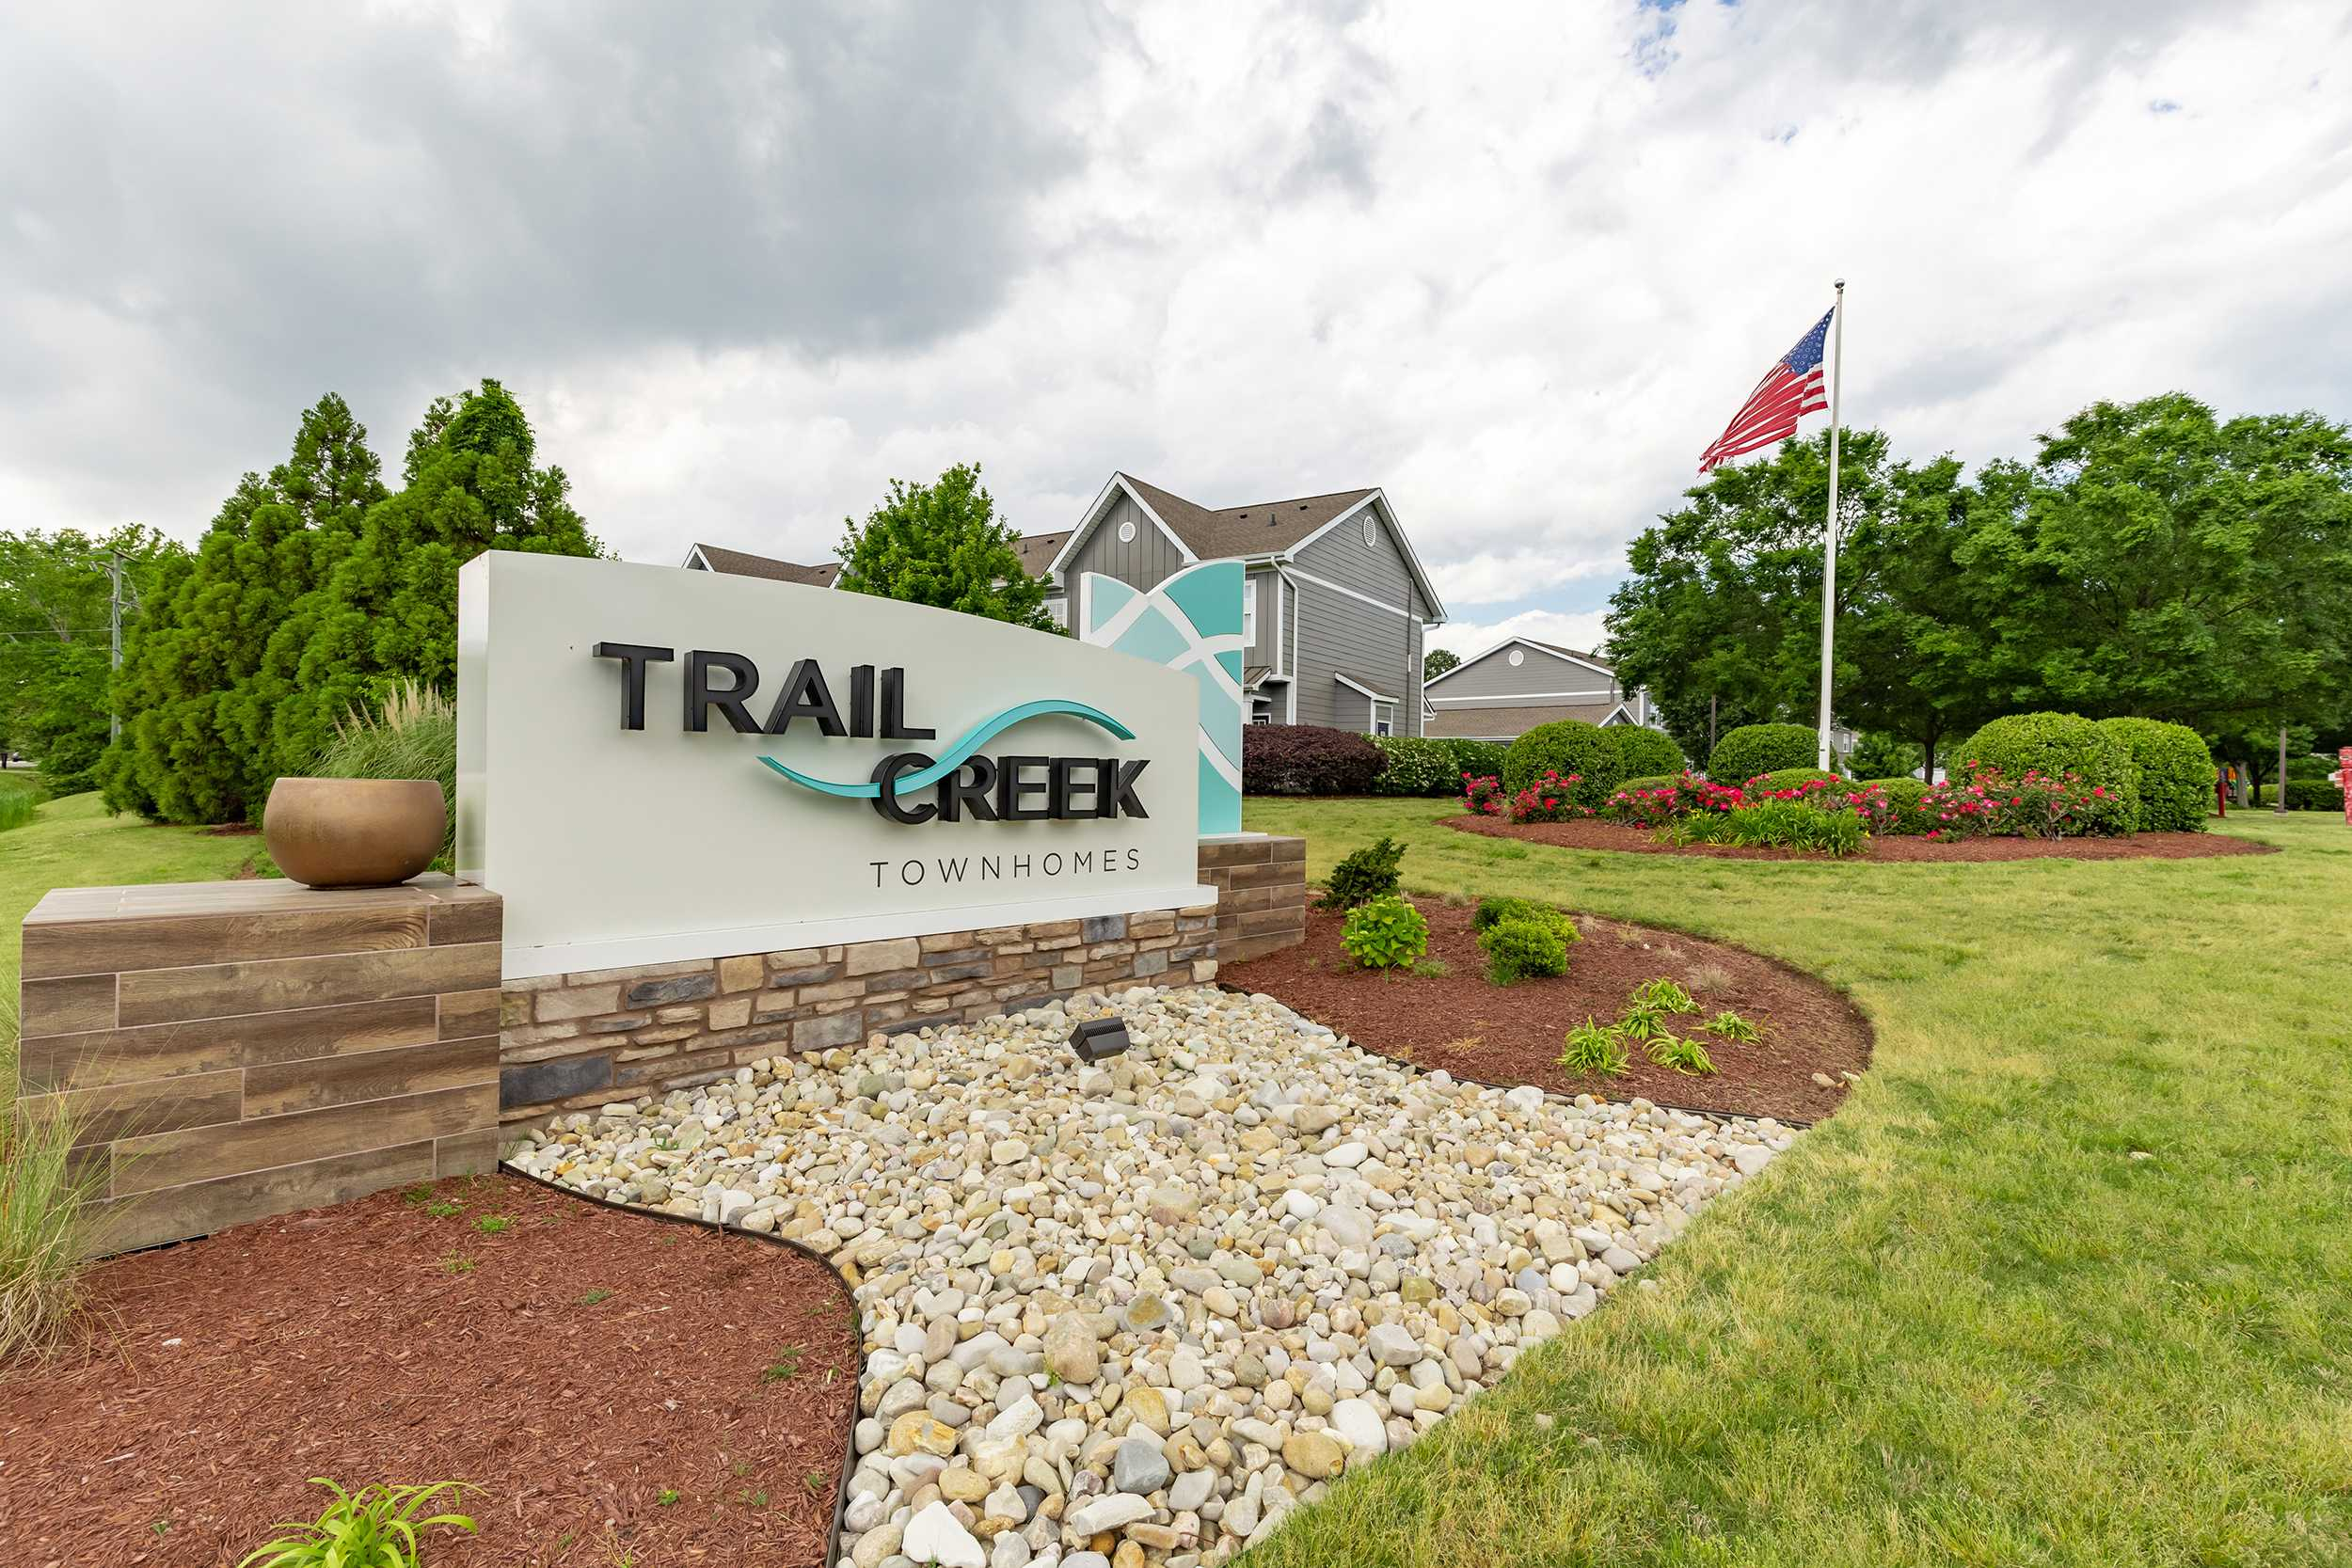 Trail Creek Townhomes